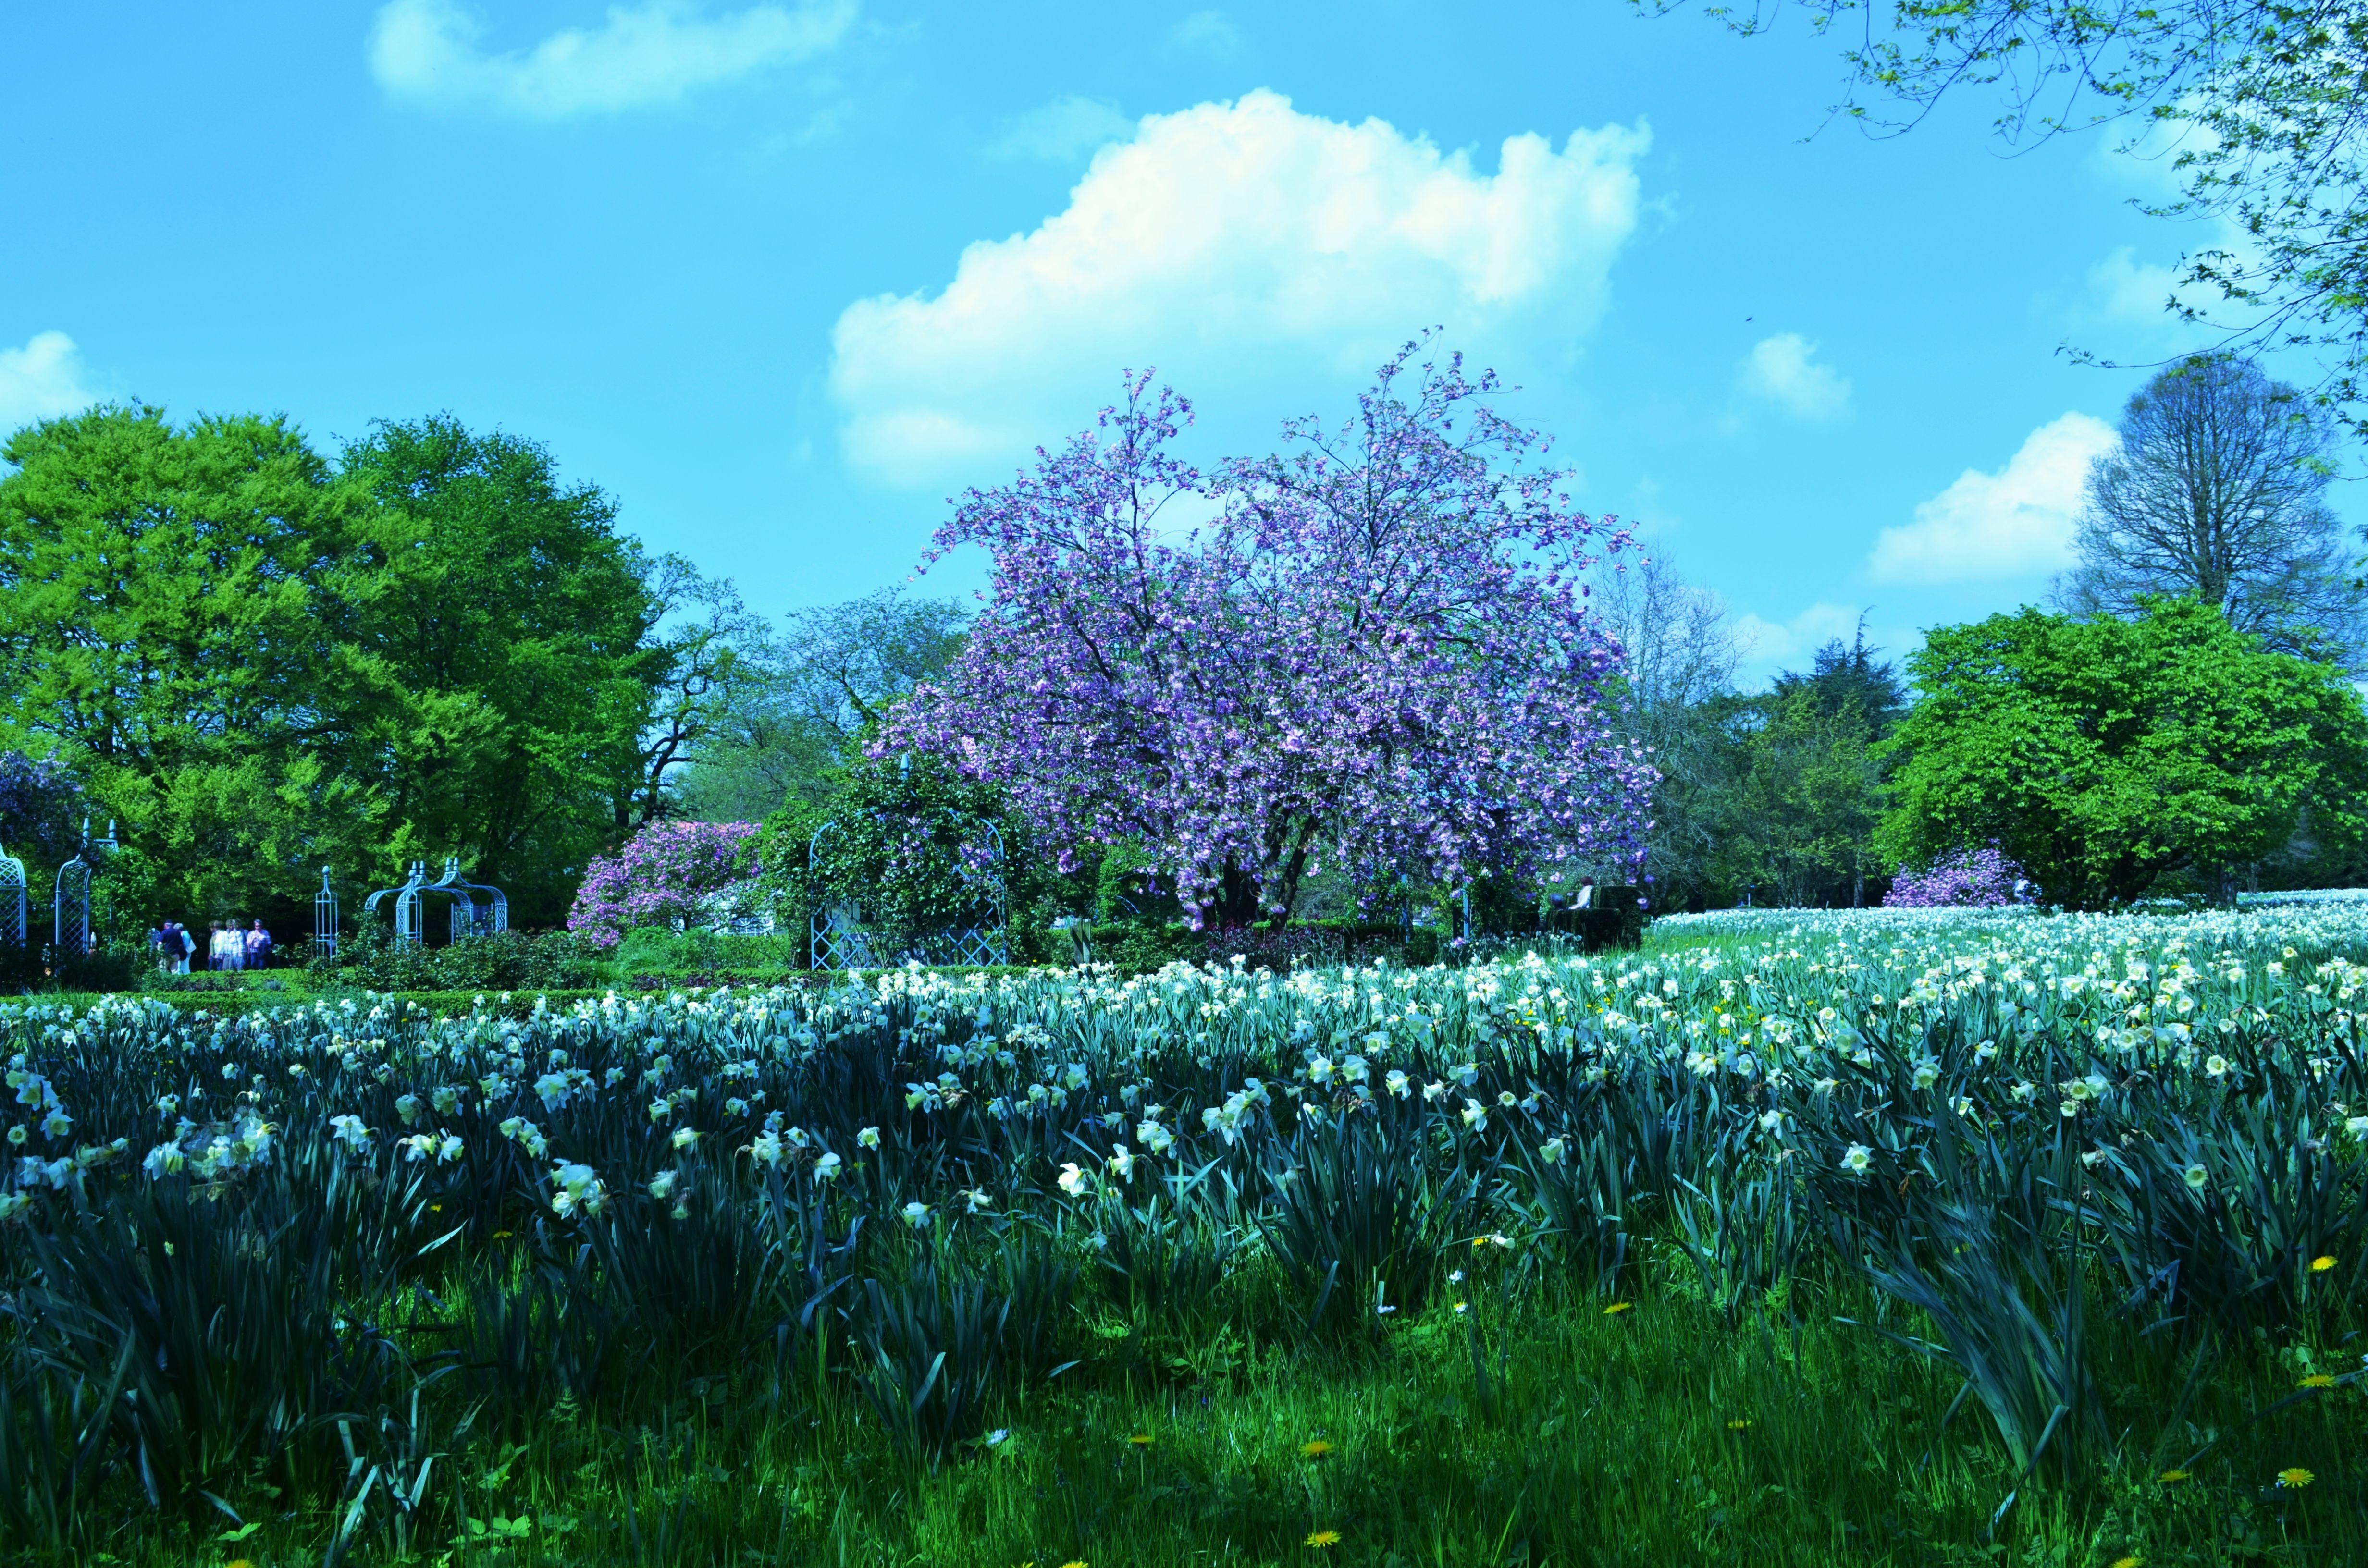 HD Nature Wallpapers Landscapes Background Images Download 4k 4928x3264